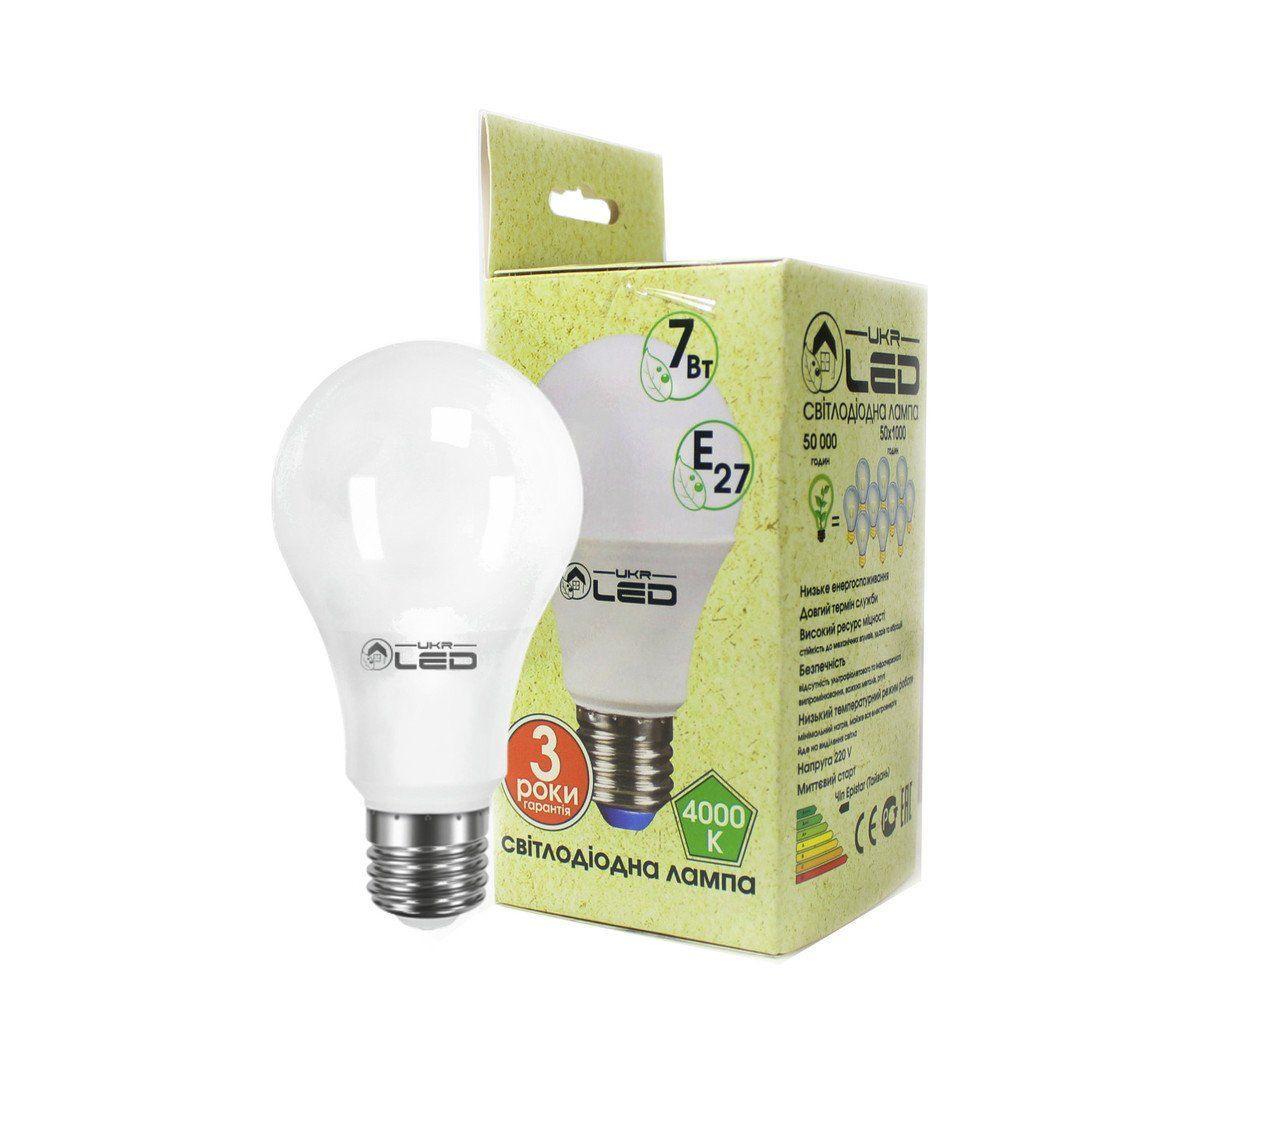 Светодиодная лампа UkrLed Е27 7W (Груша) 4000К